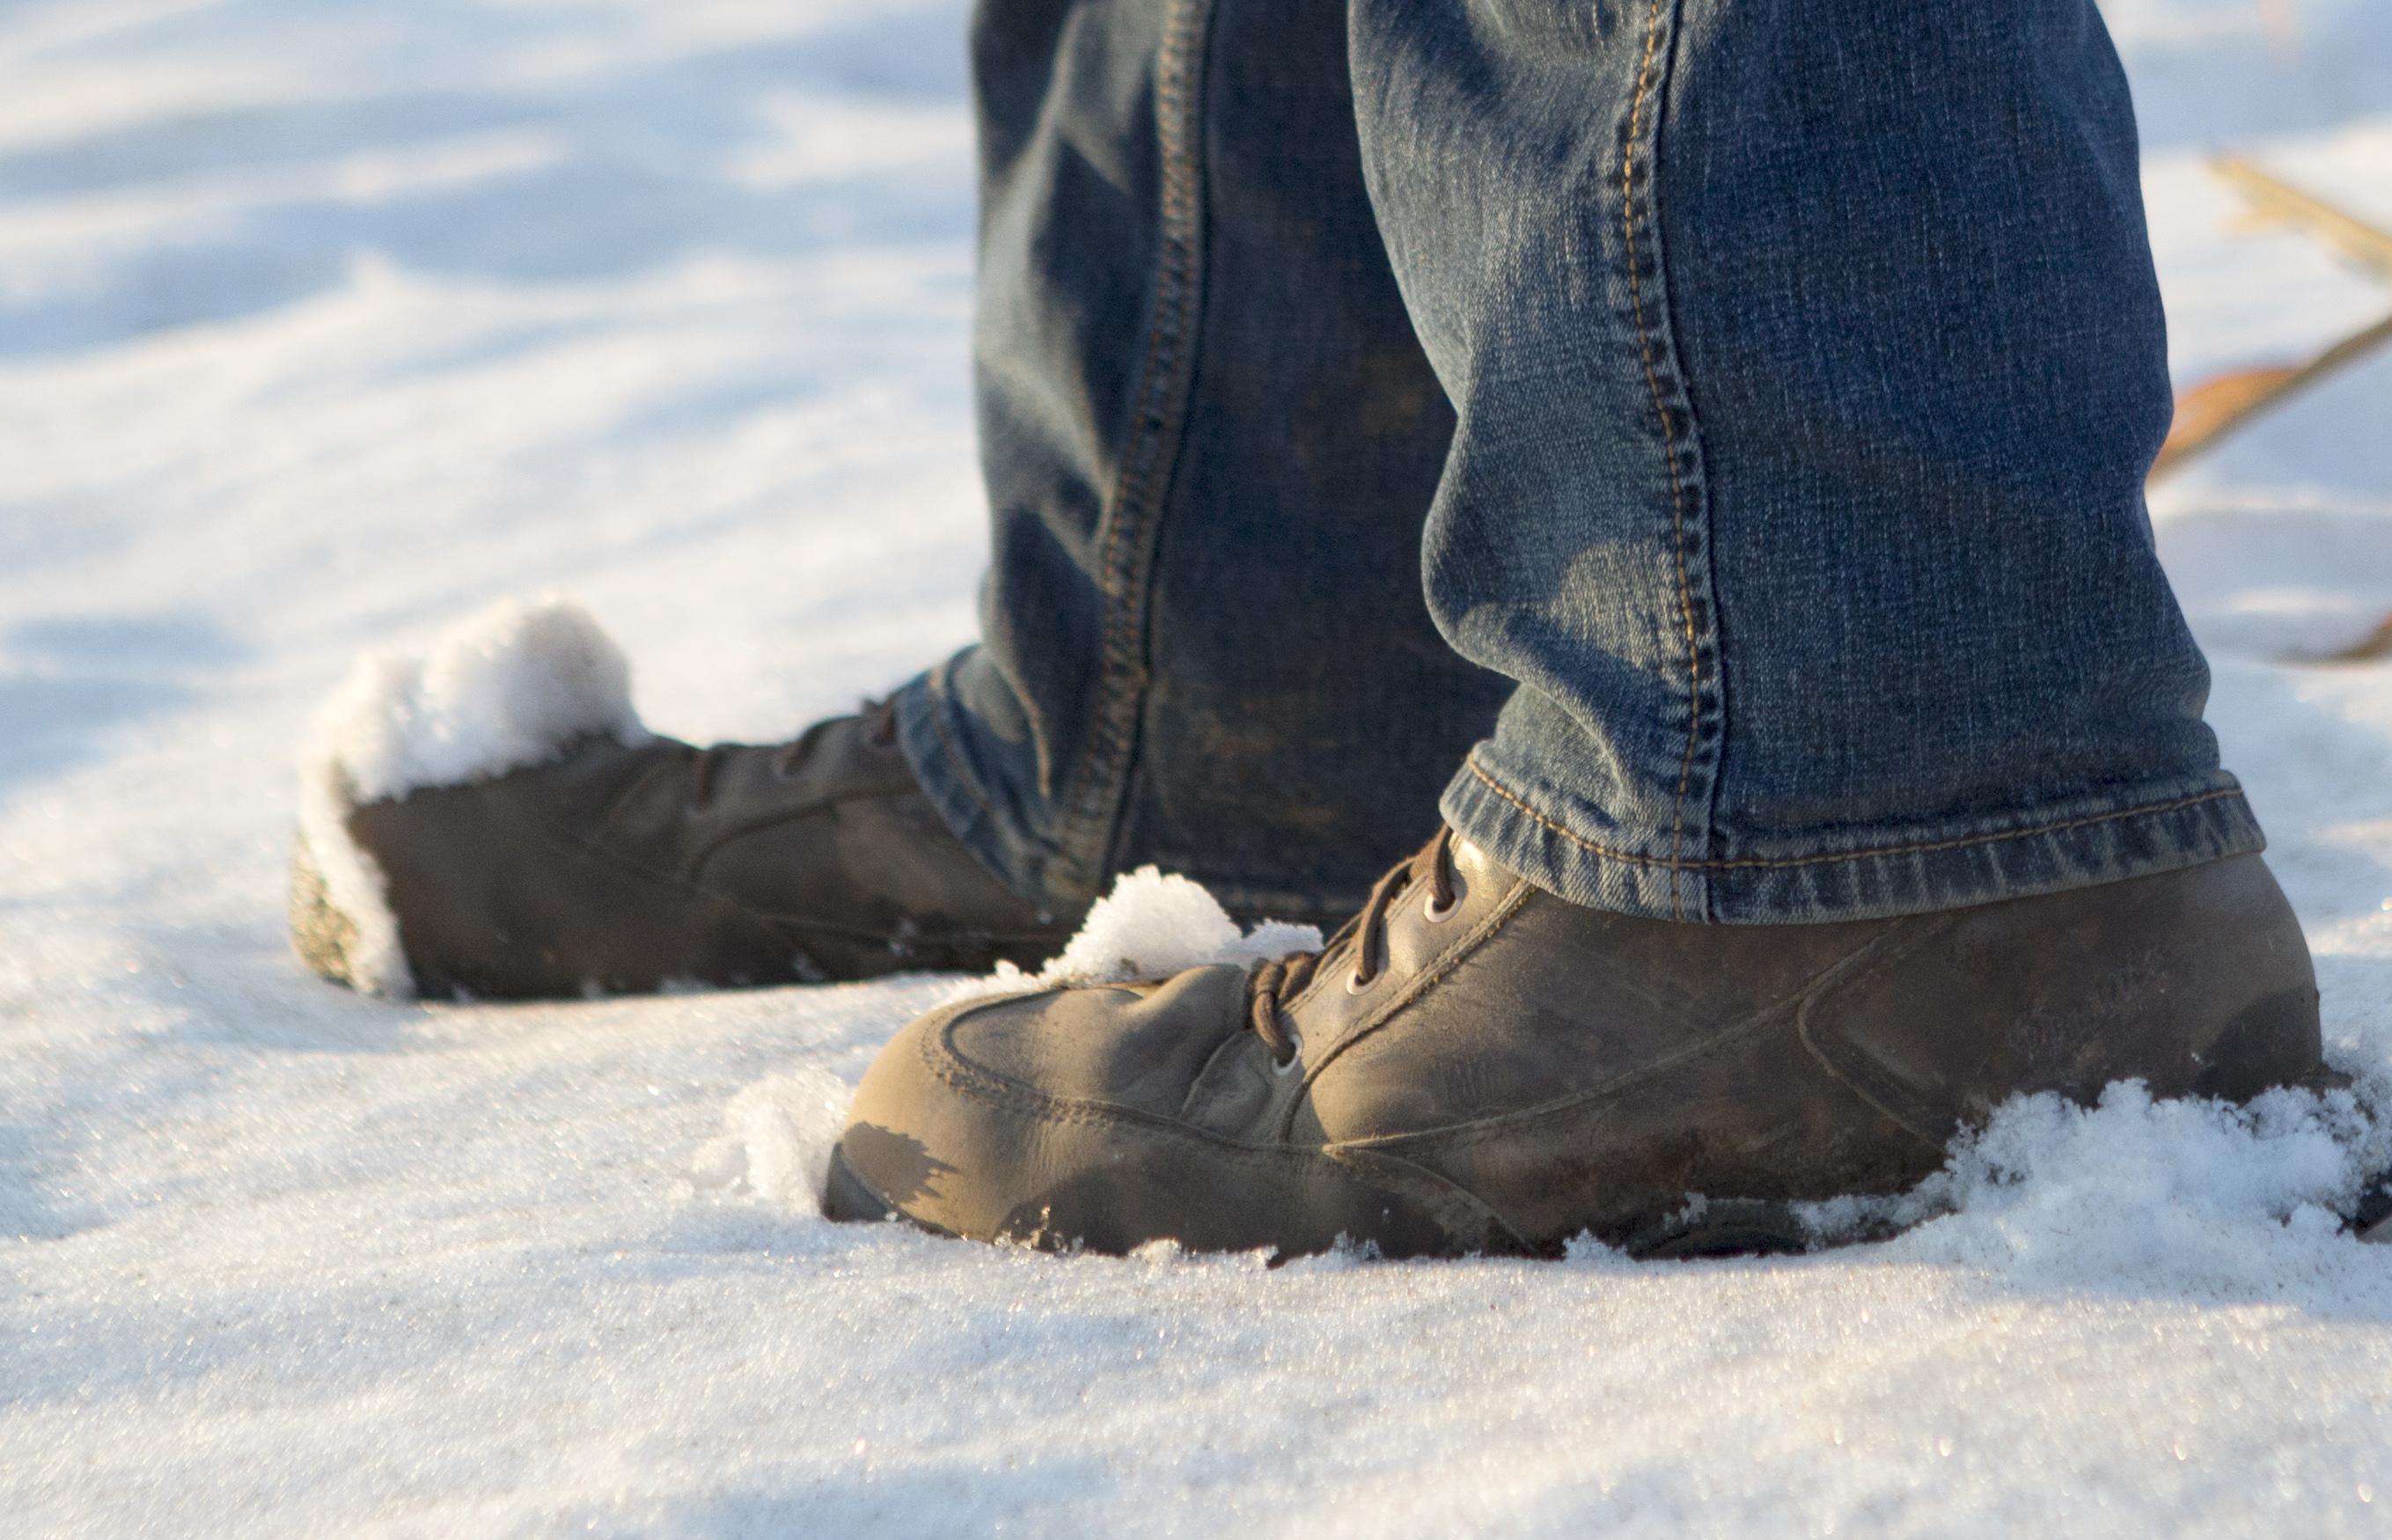 1bf79c37870 Danner Pronghorn Hunting Boot: A Season-Long Test | GearJunkie